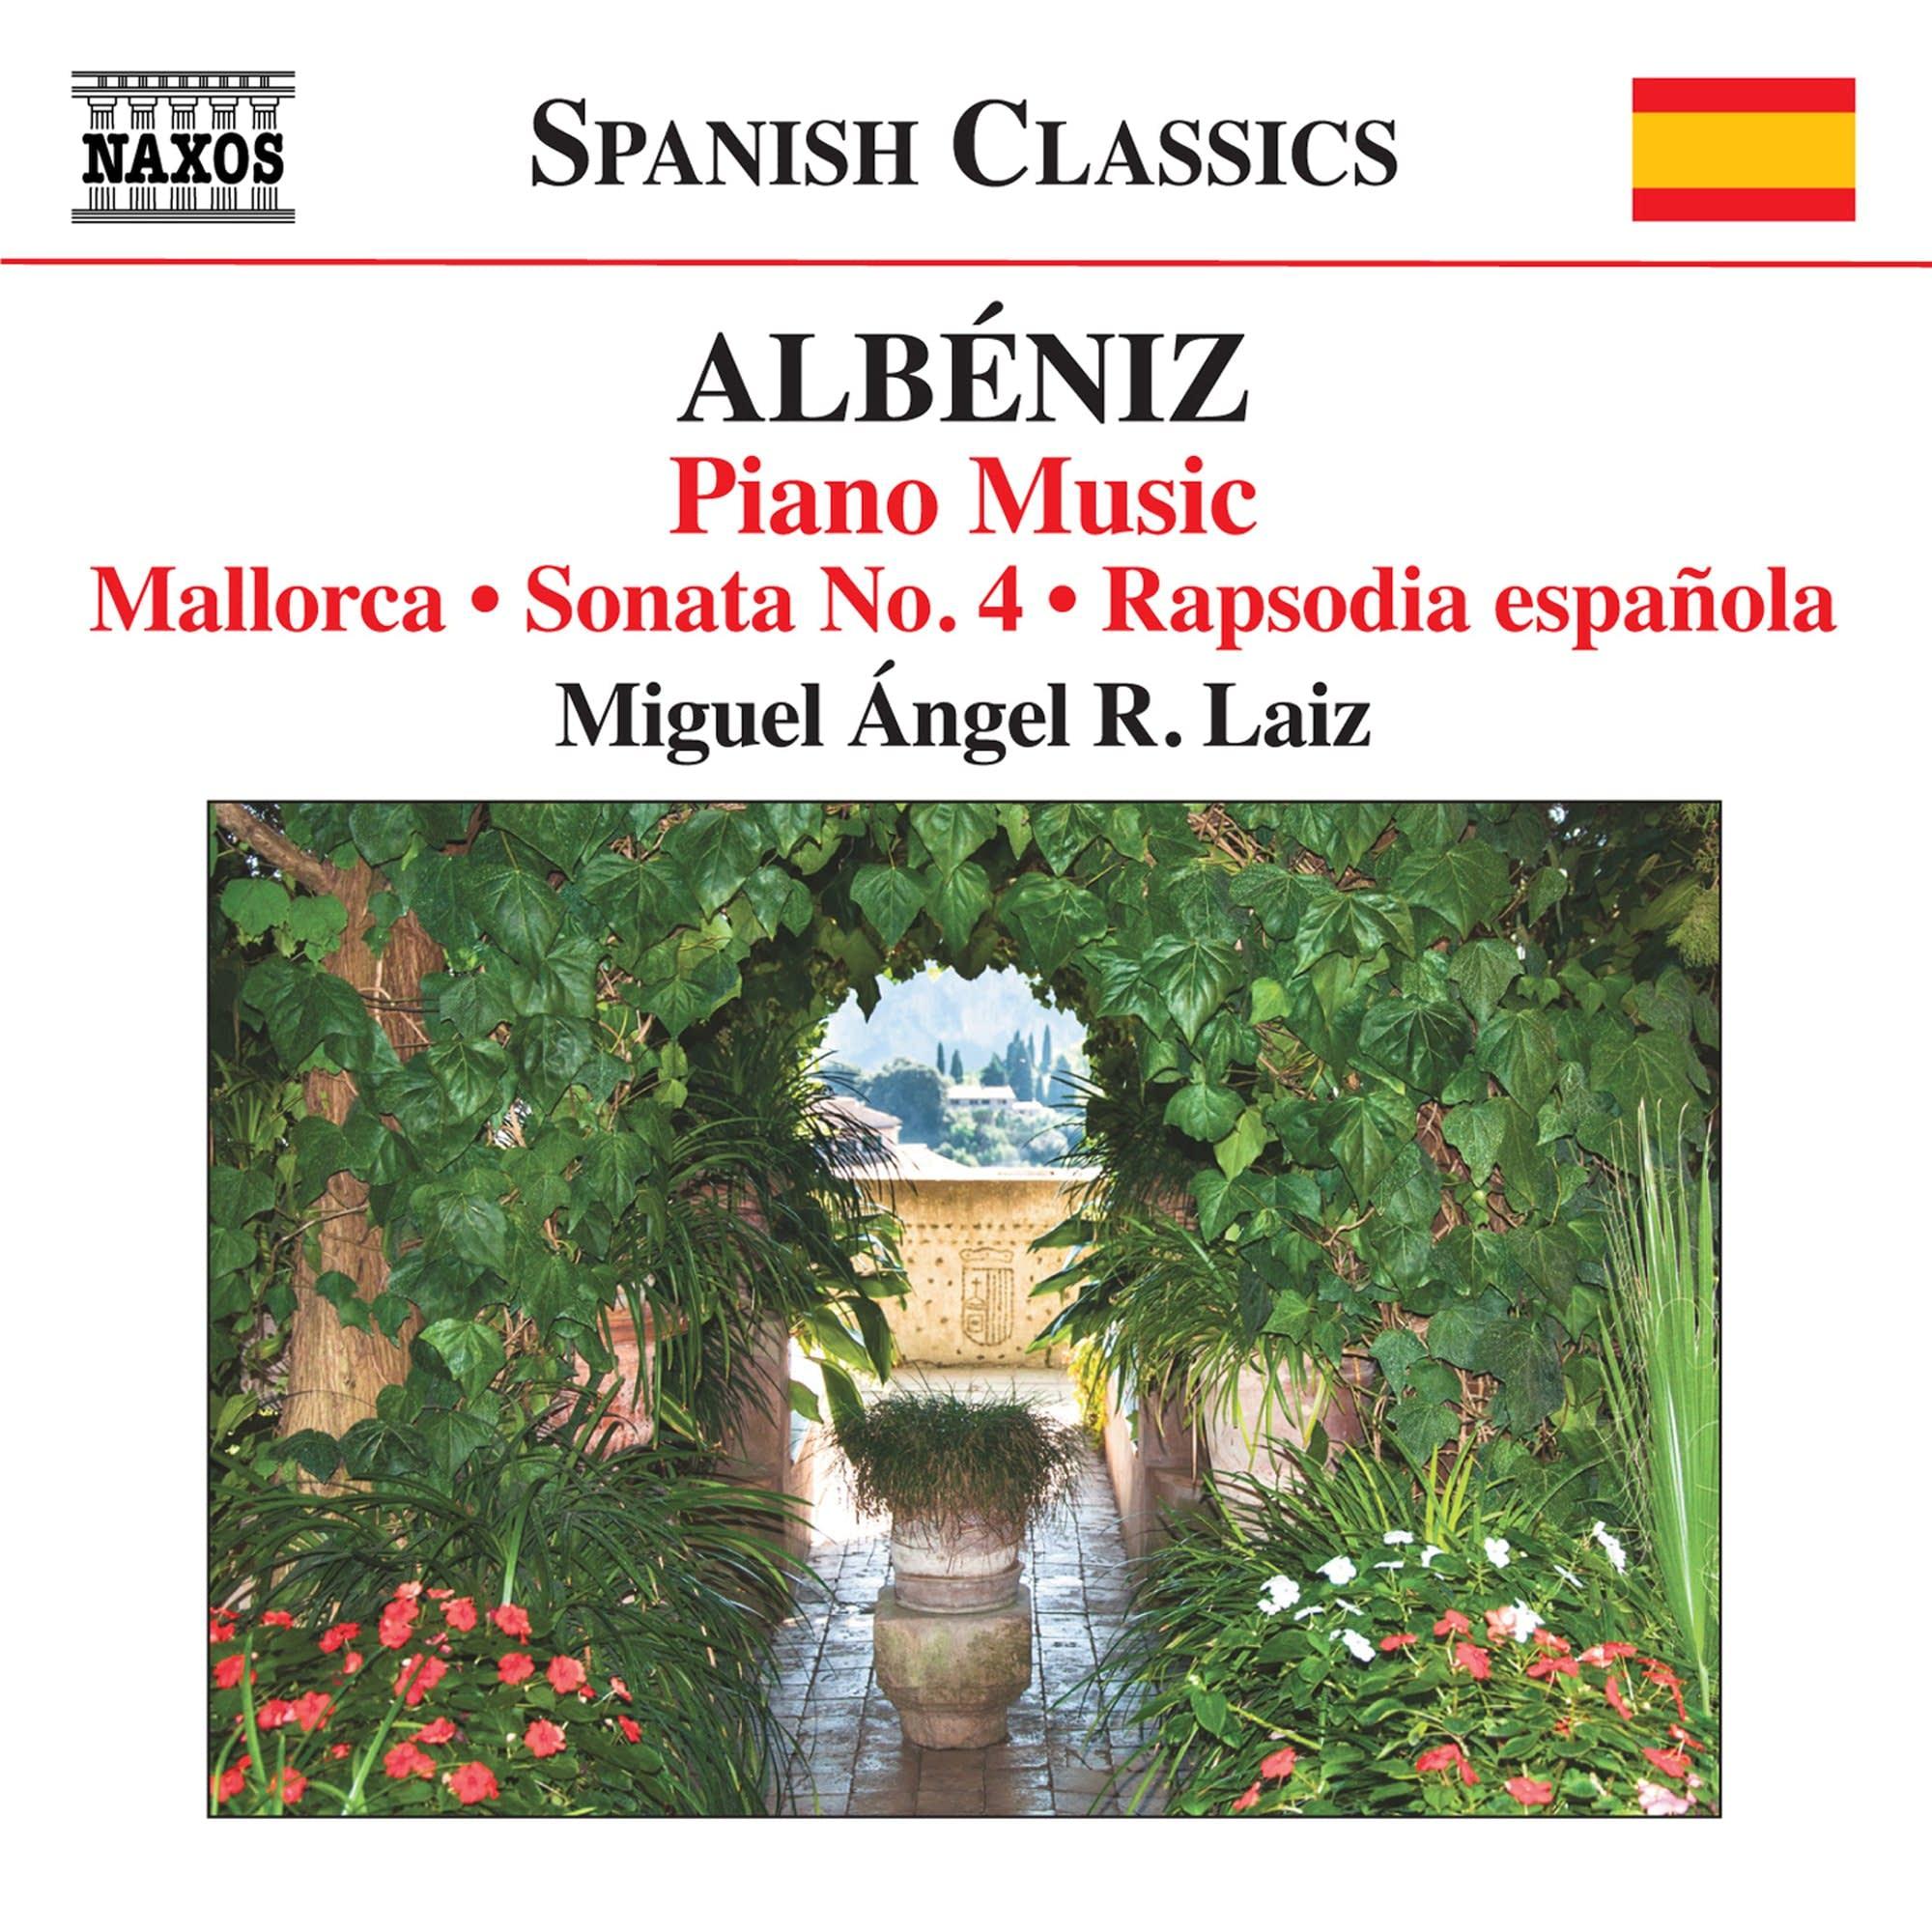 Isaac Albeniz - Mallorca, barcarolle Naxos 8.573779